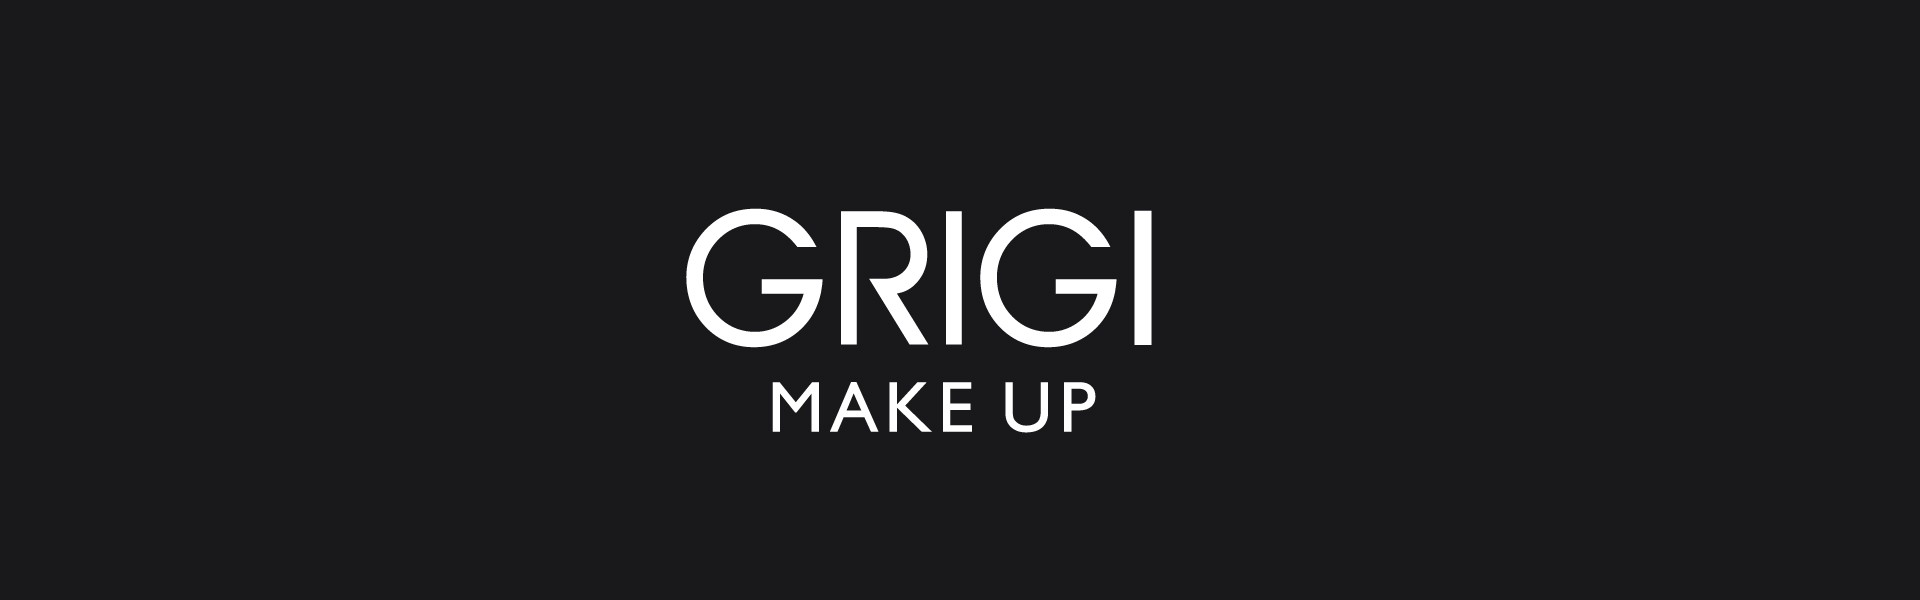 Grigi